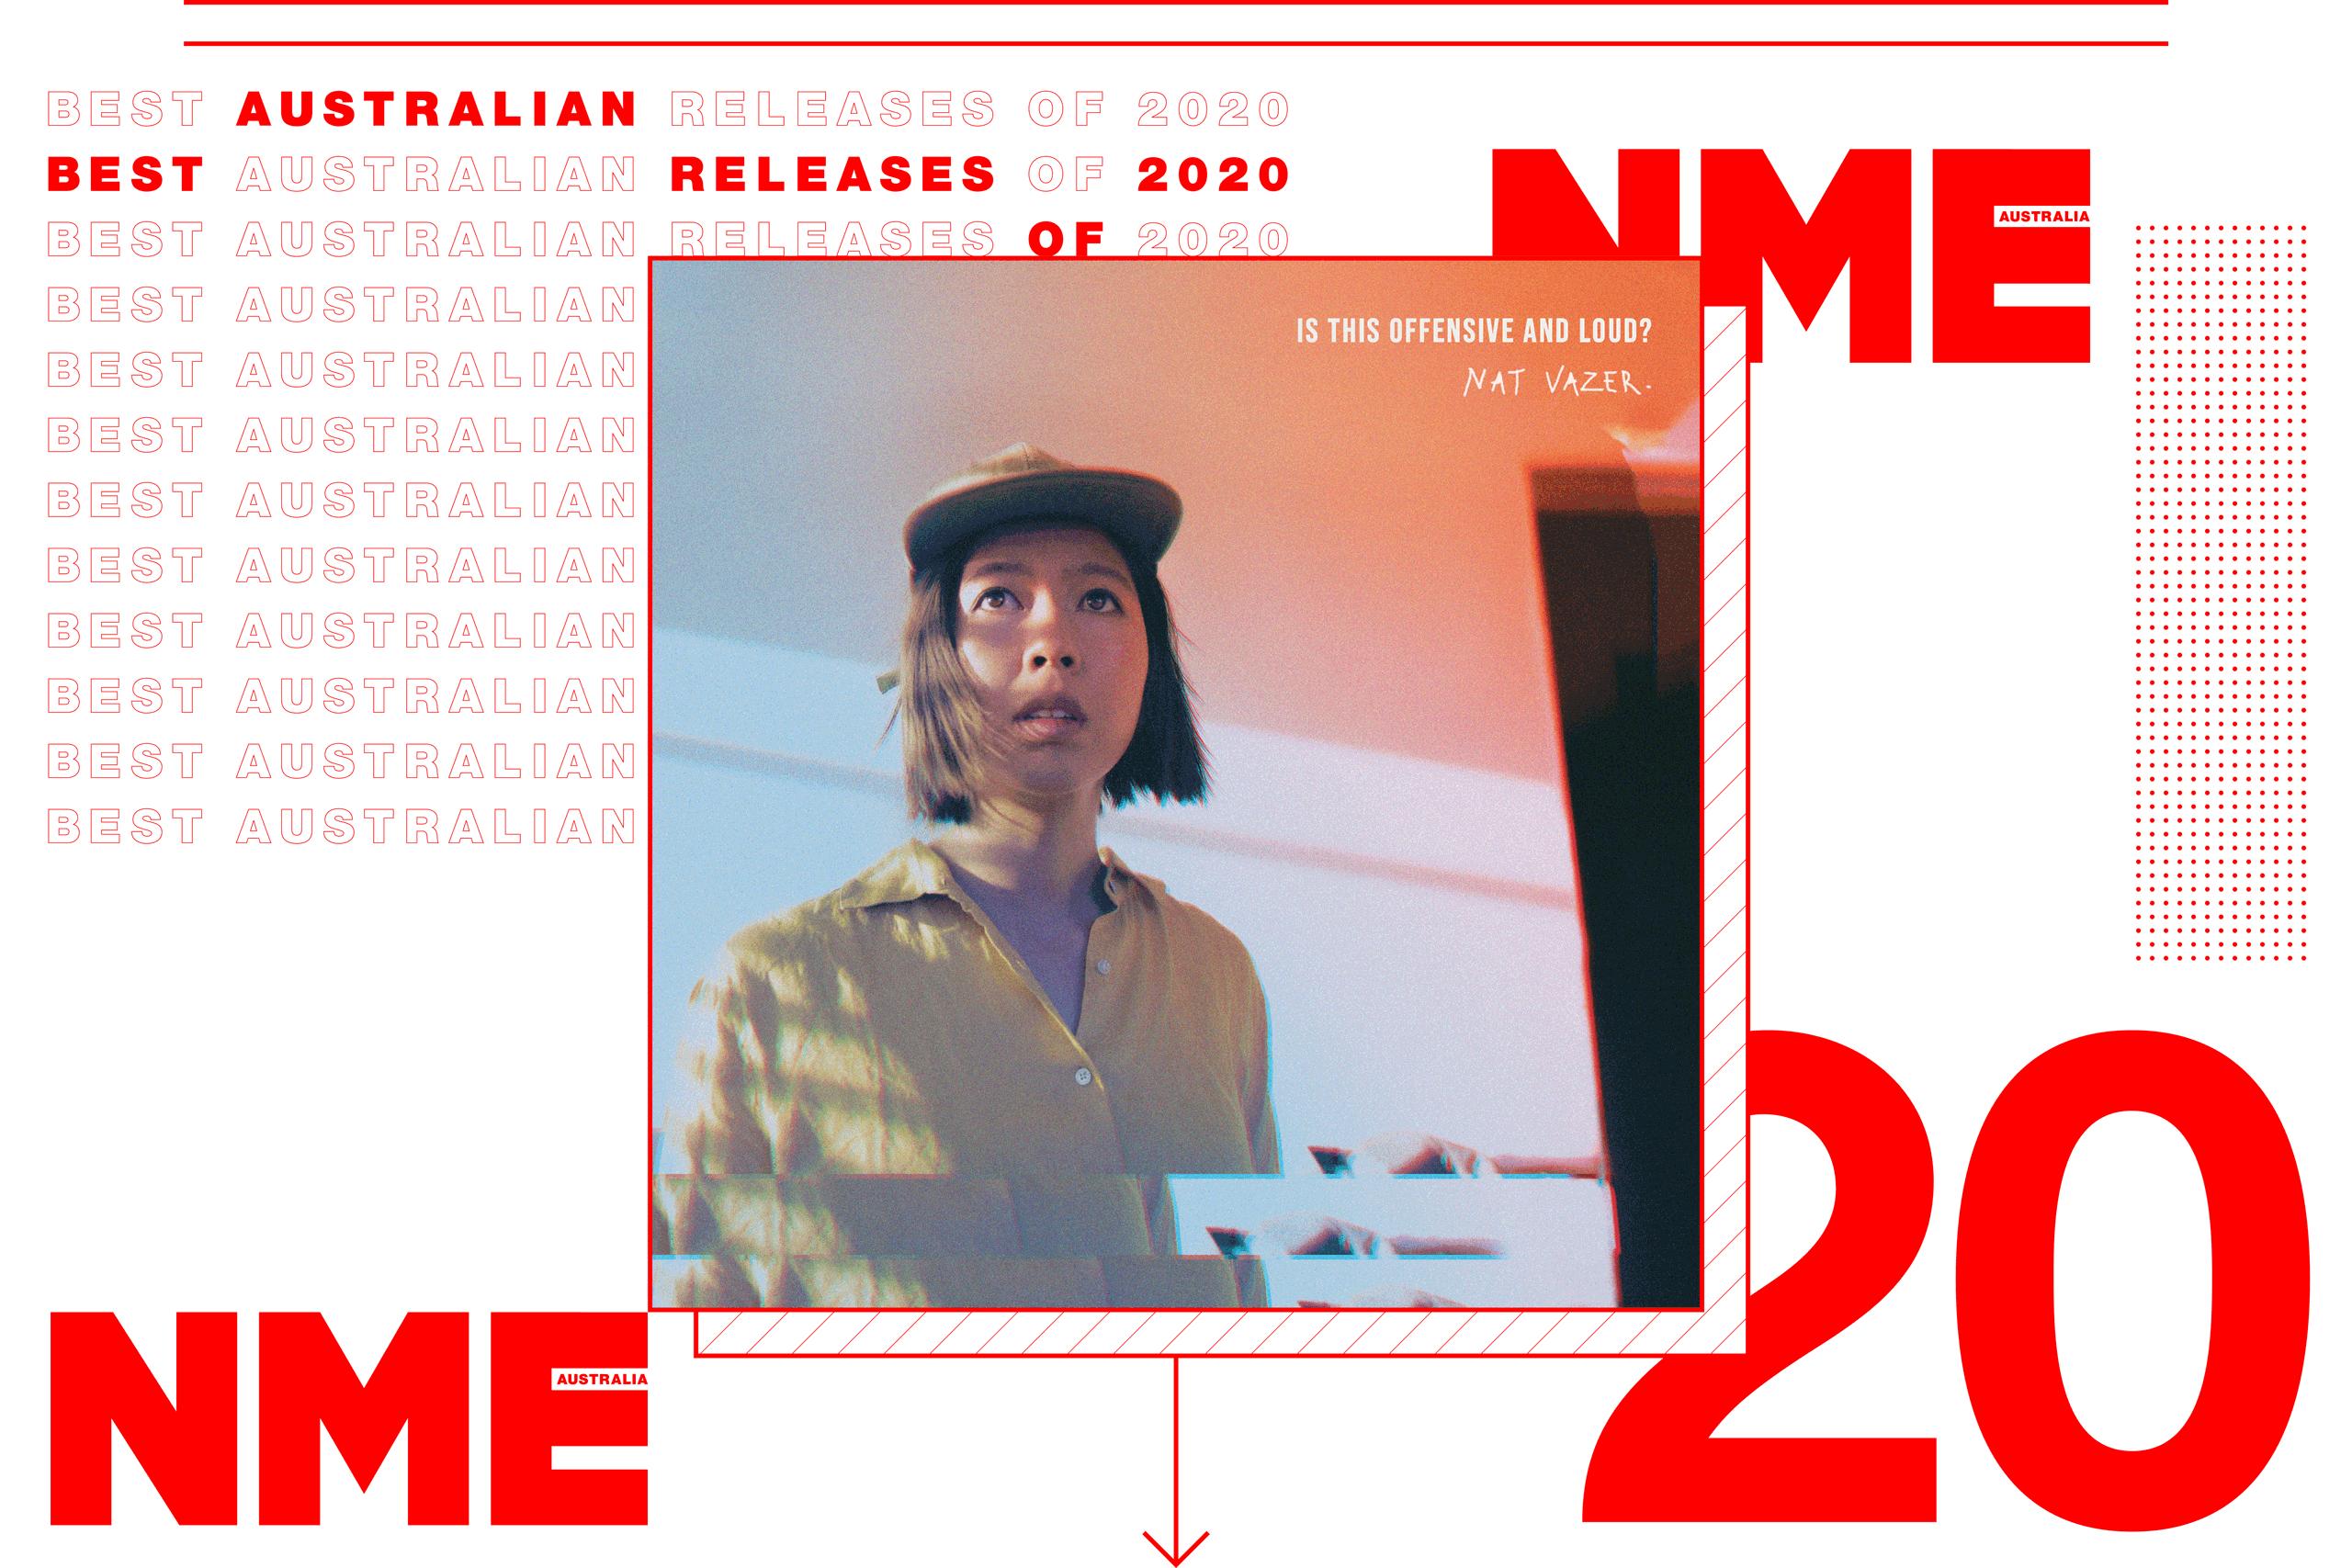 NME Australian Album Release 20